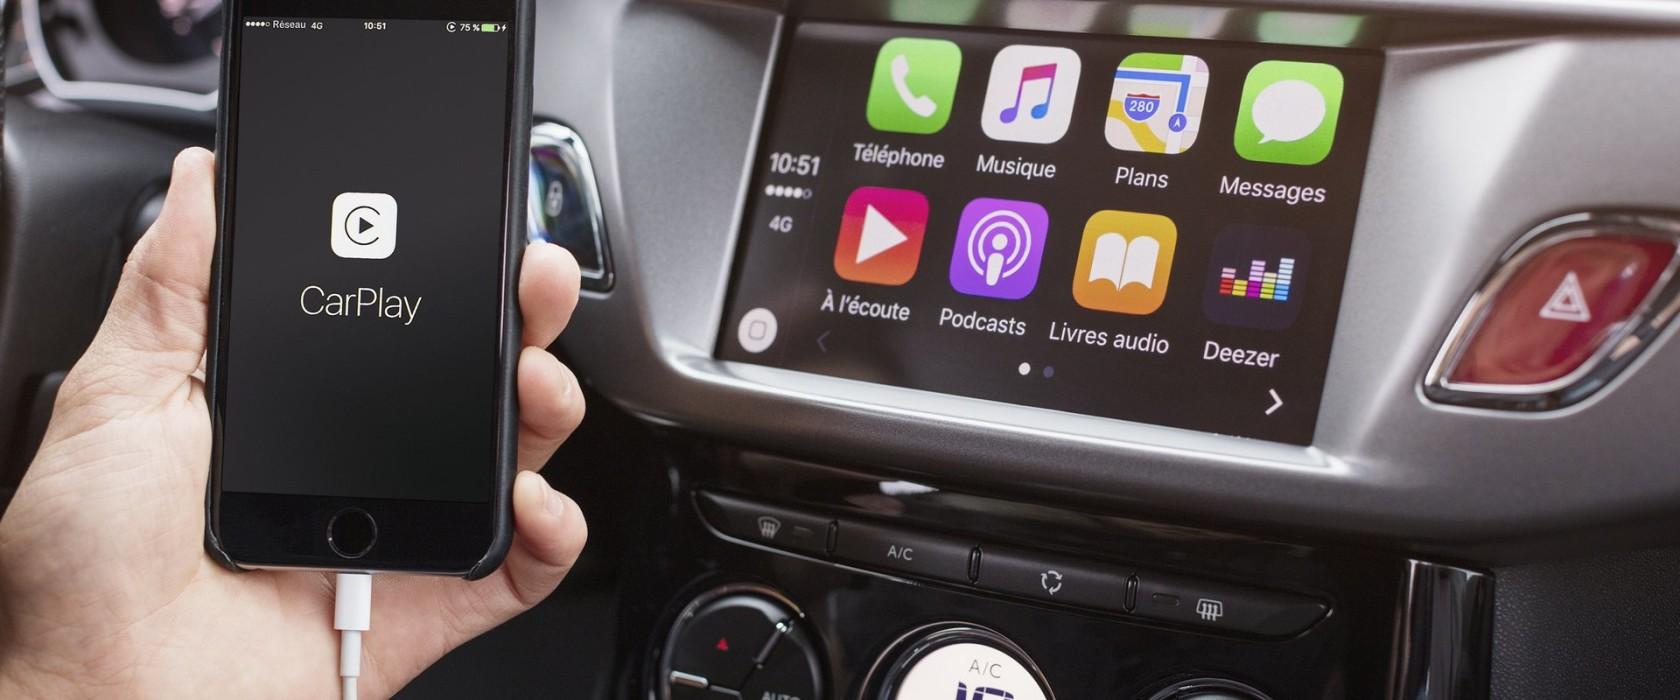 come funzionano apple carplay android auto mirrorlink motorpedia red live. Black Bedroom Furniture Sets. Home Design Ideas